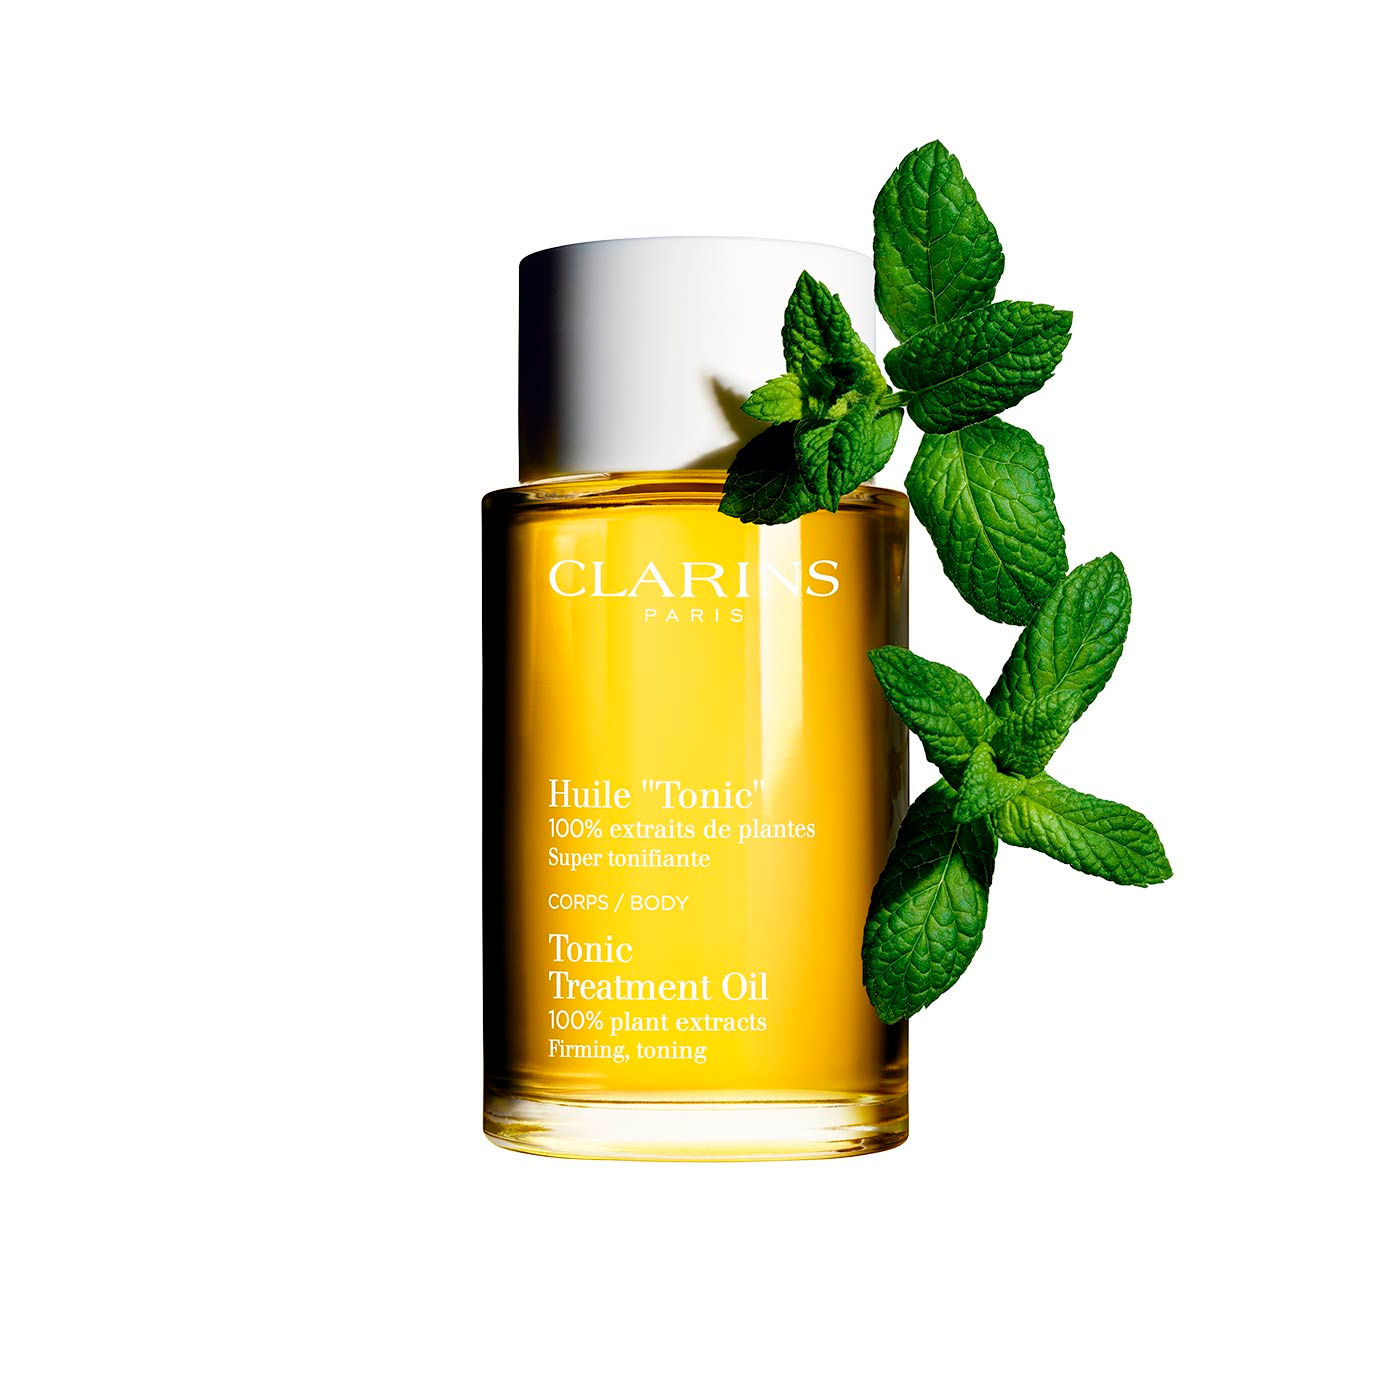 011_clarins_huile-tonic_gala_perfumeries_perfumes_andorra